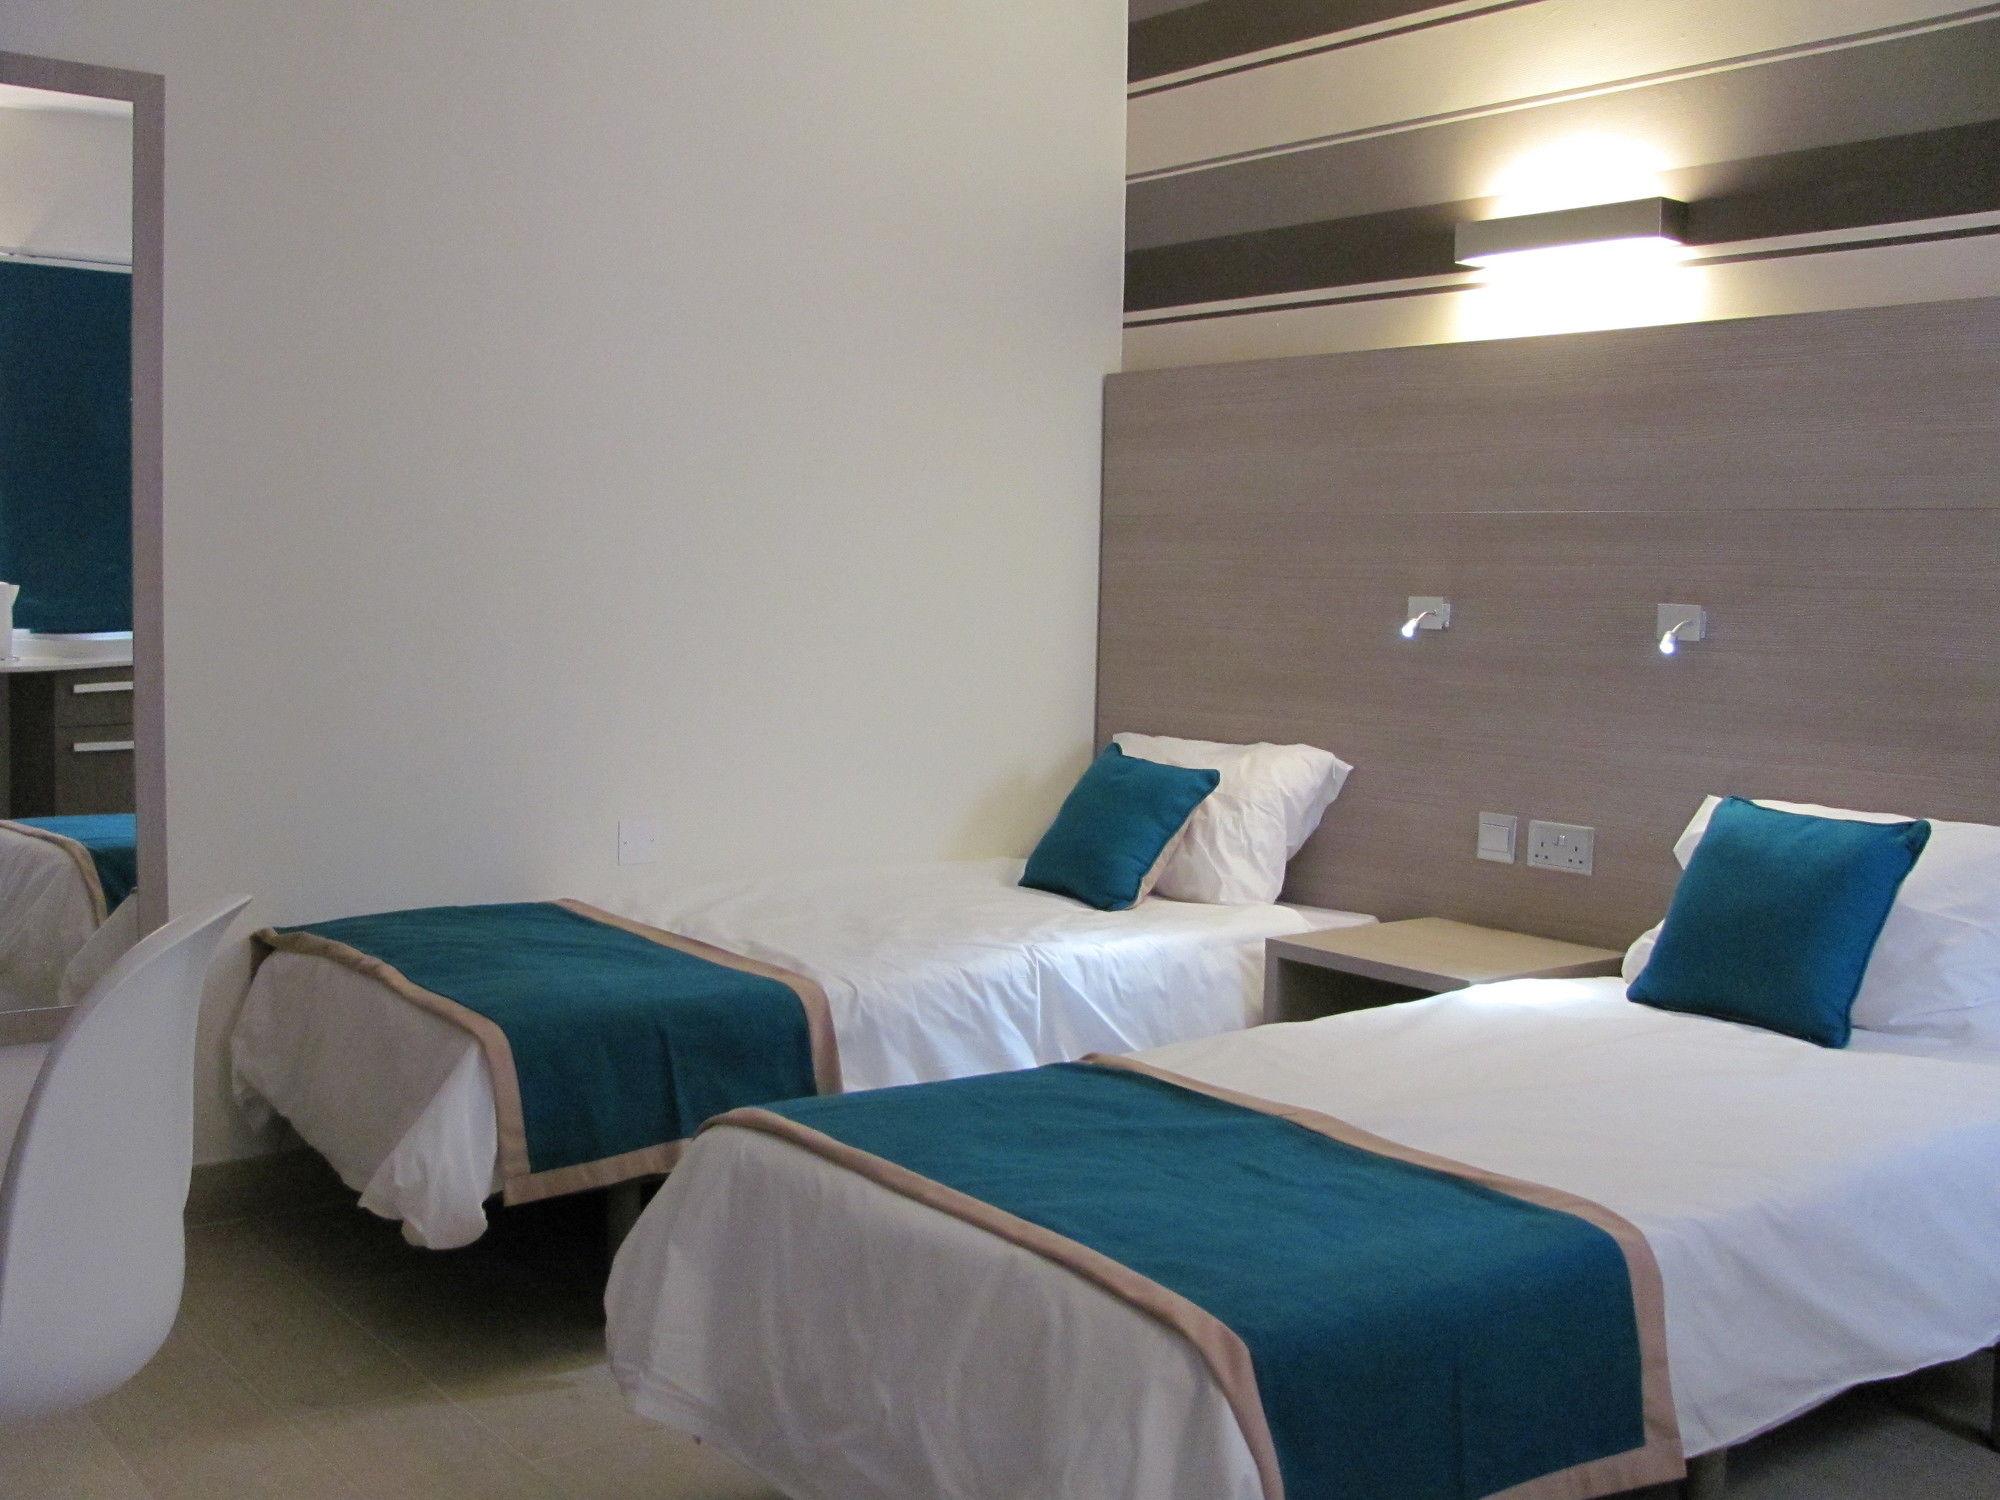 Days Inn Hotel and Residence